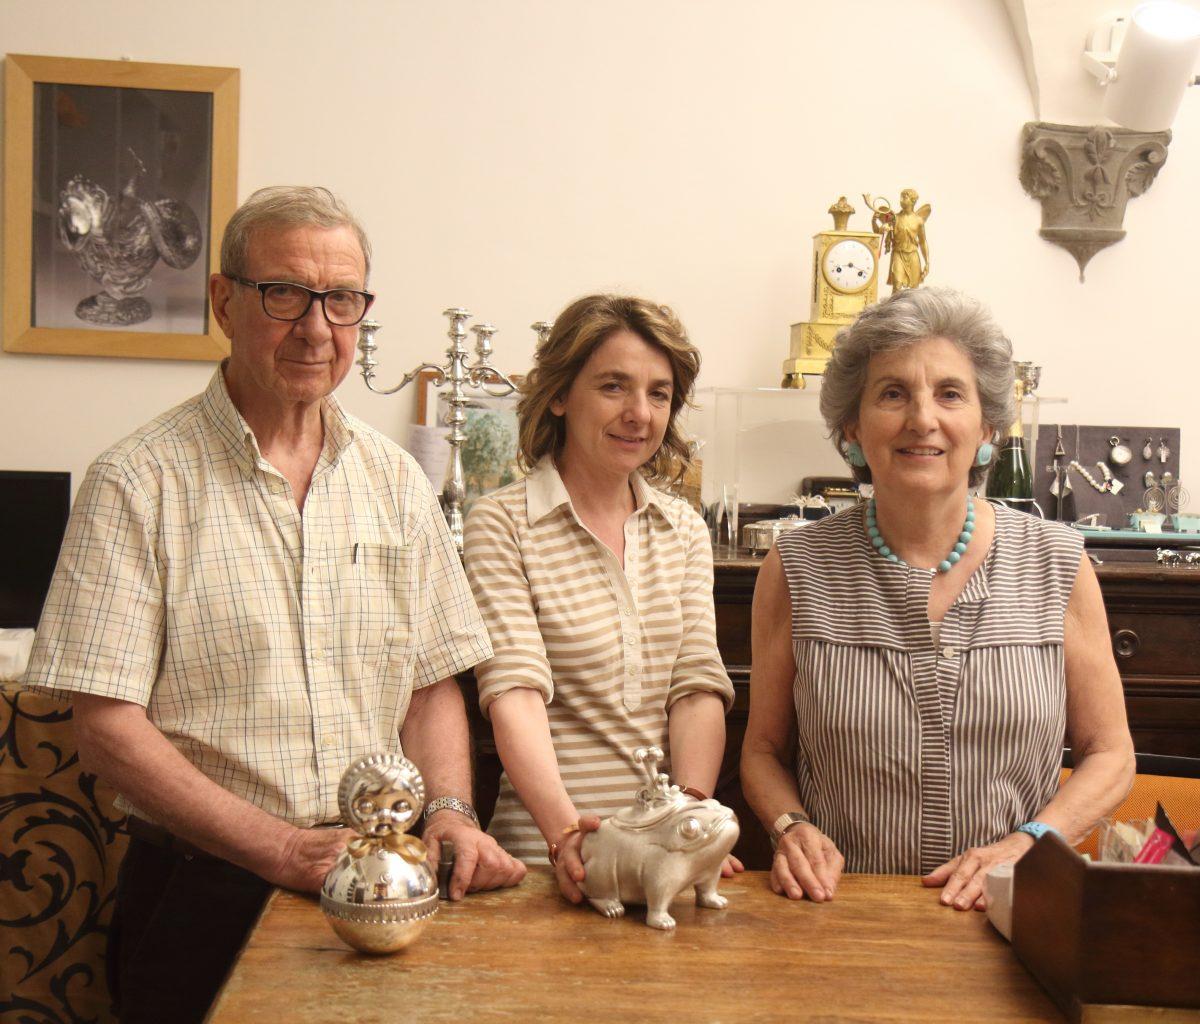 Family Pagliai Florence